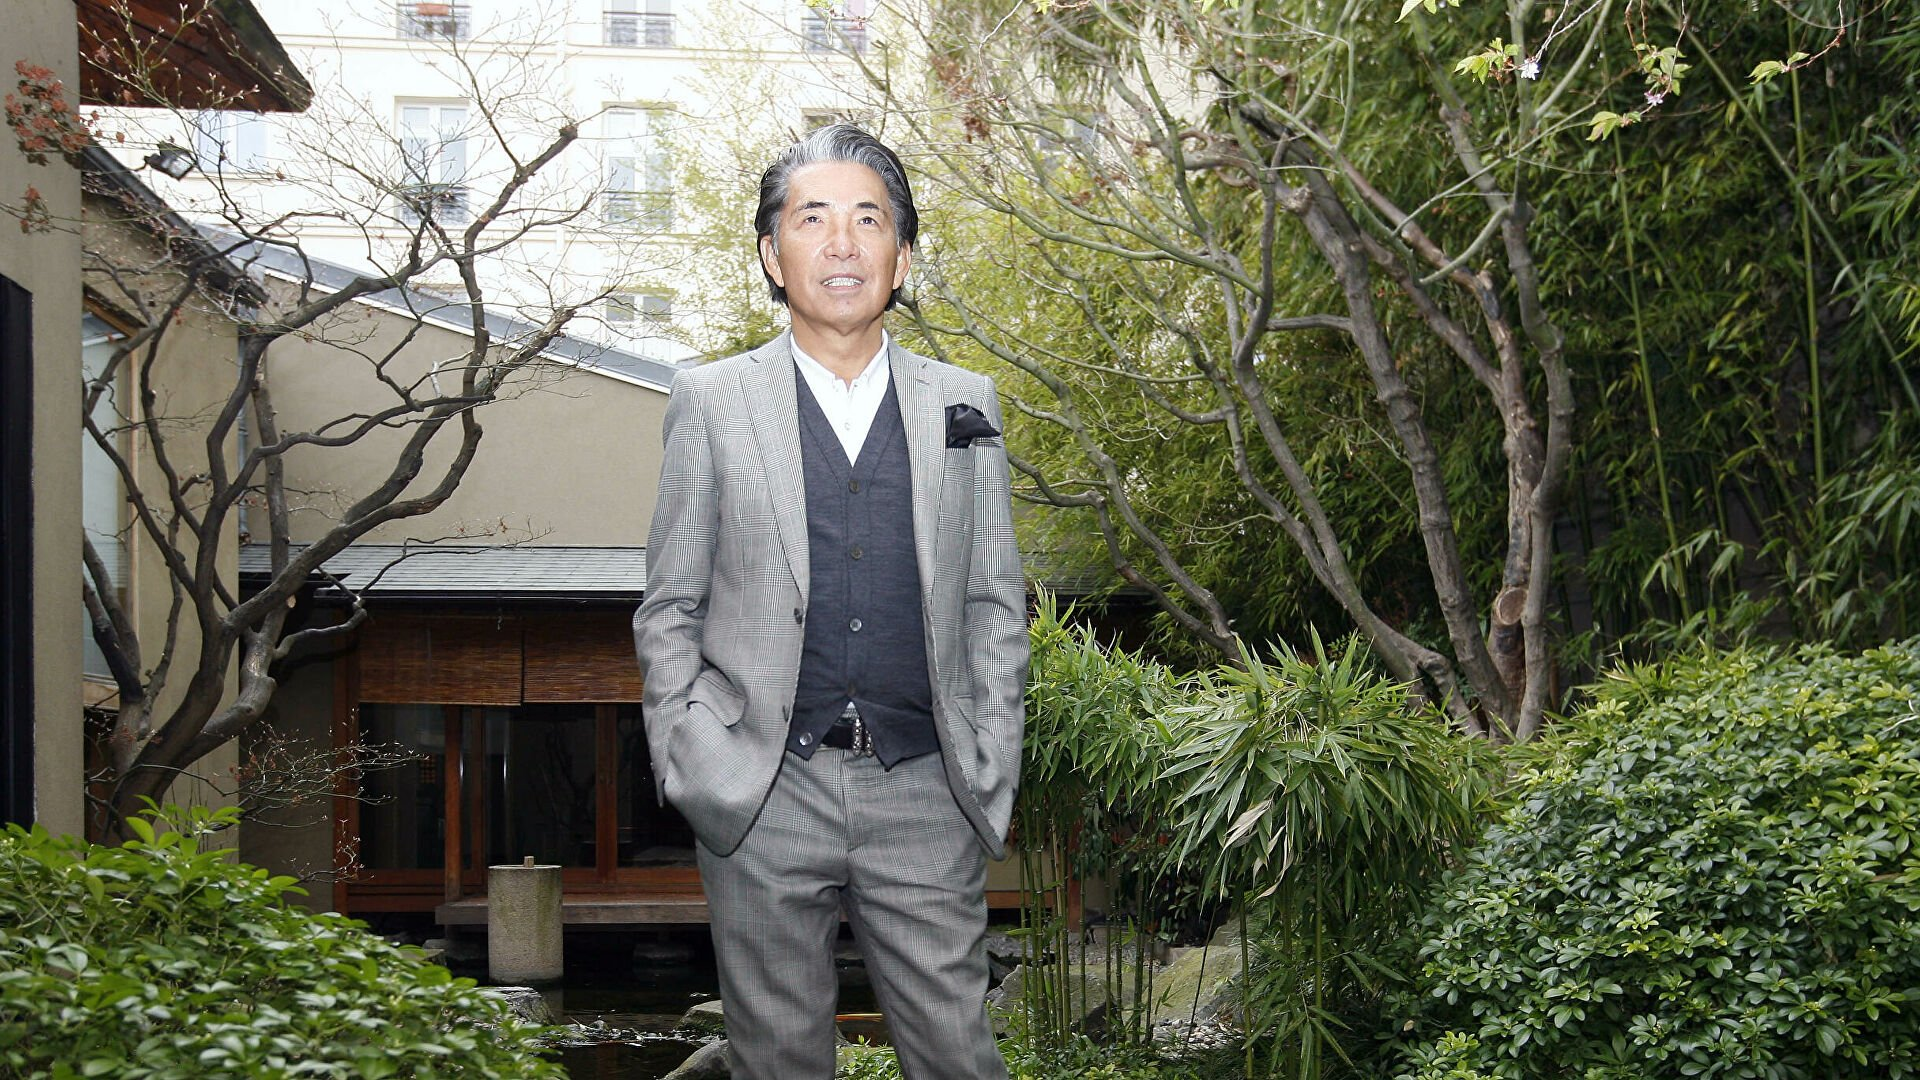 От коронавируса умер Кендзо Такада — основатель знаменитого дома моды Kenzo